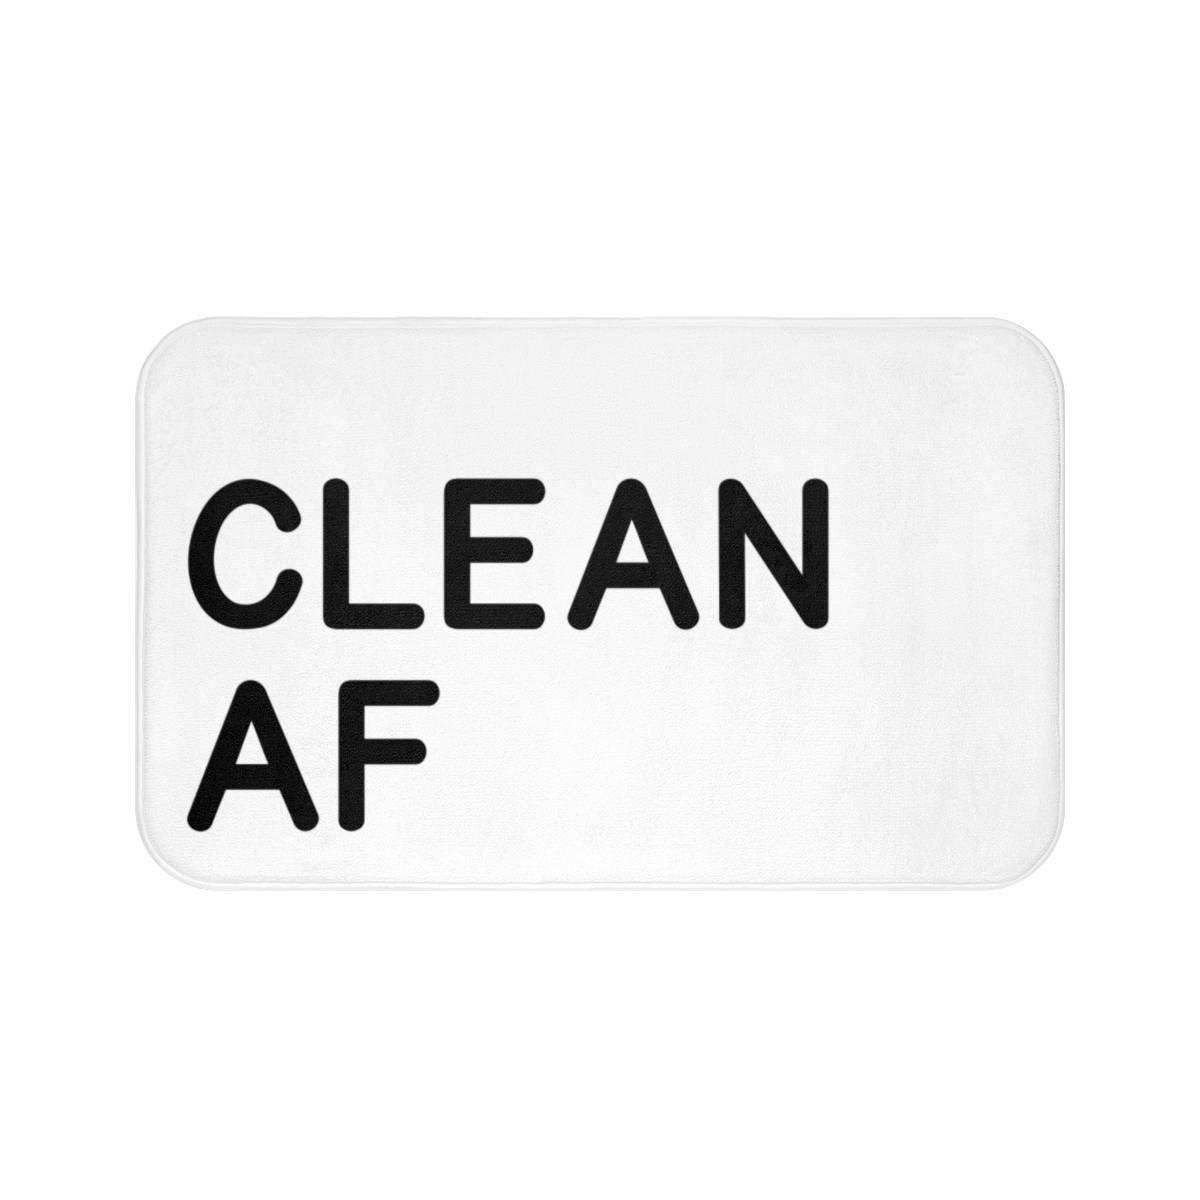 Clean Af Bath Mat Coral Fleece Area Rug Door Mat Bathroom Decor Entrance Rug Floor Mats 16X24 Theobald Jordan